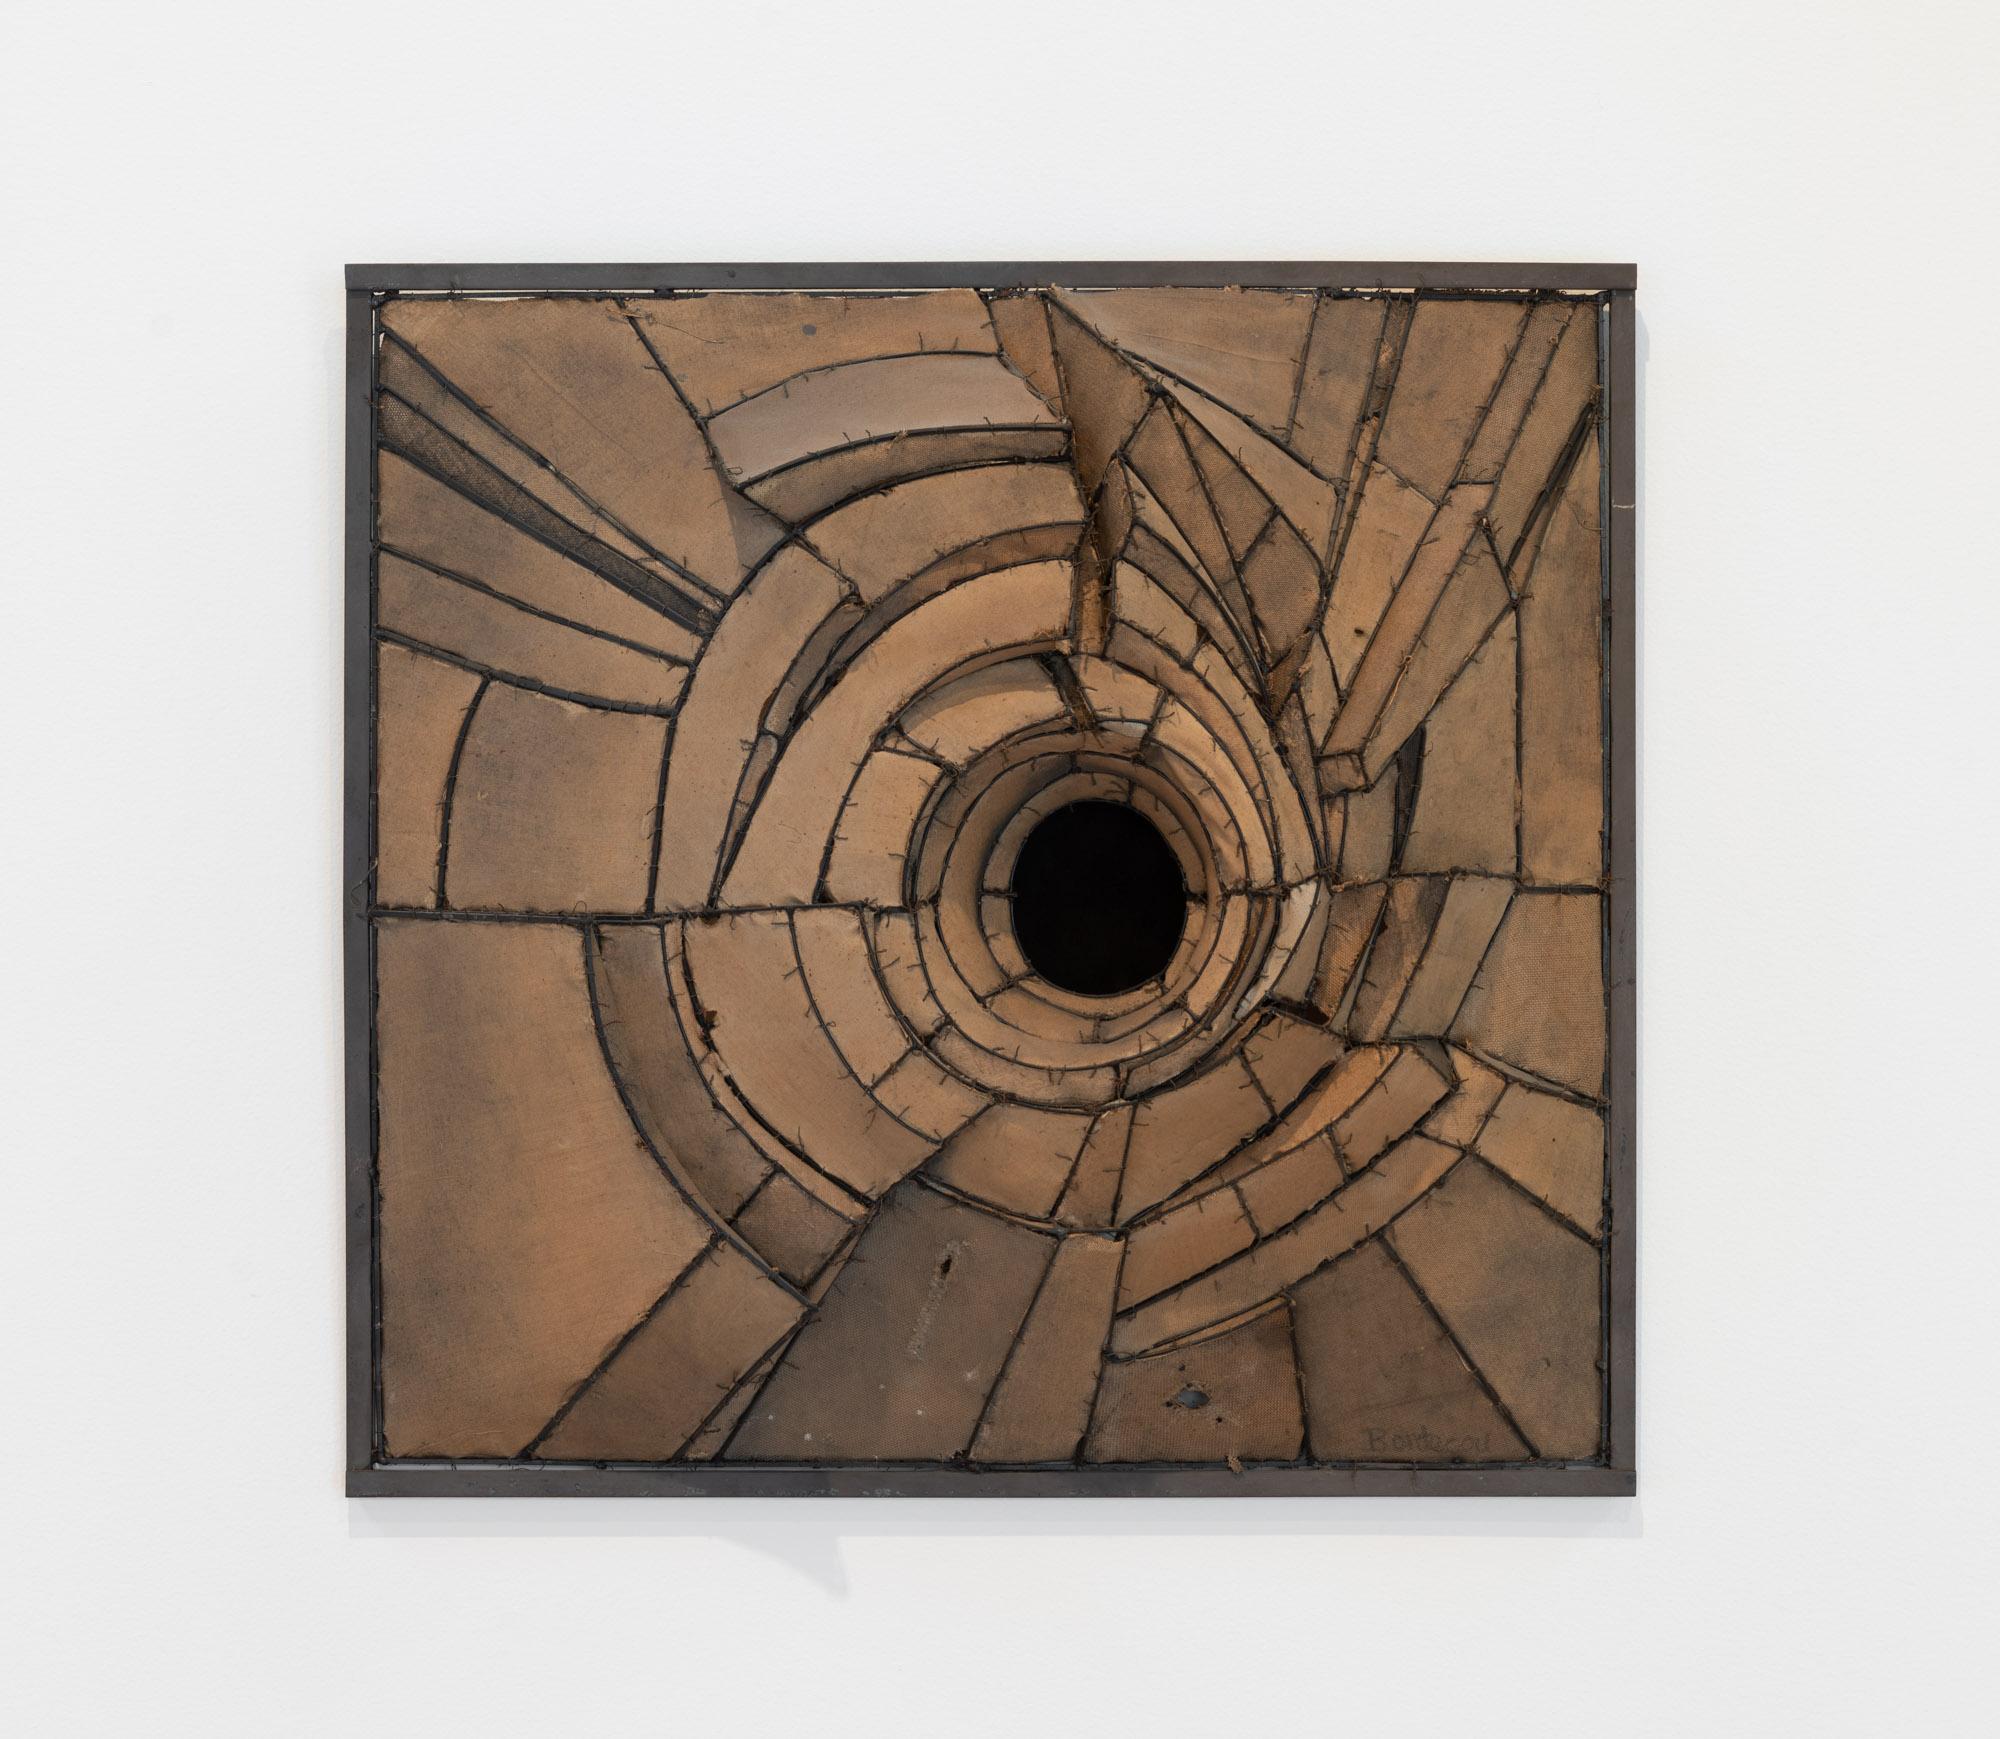 Lee Bontecou, Untitled Relief